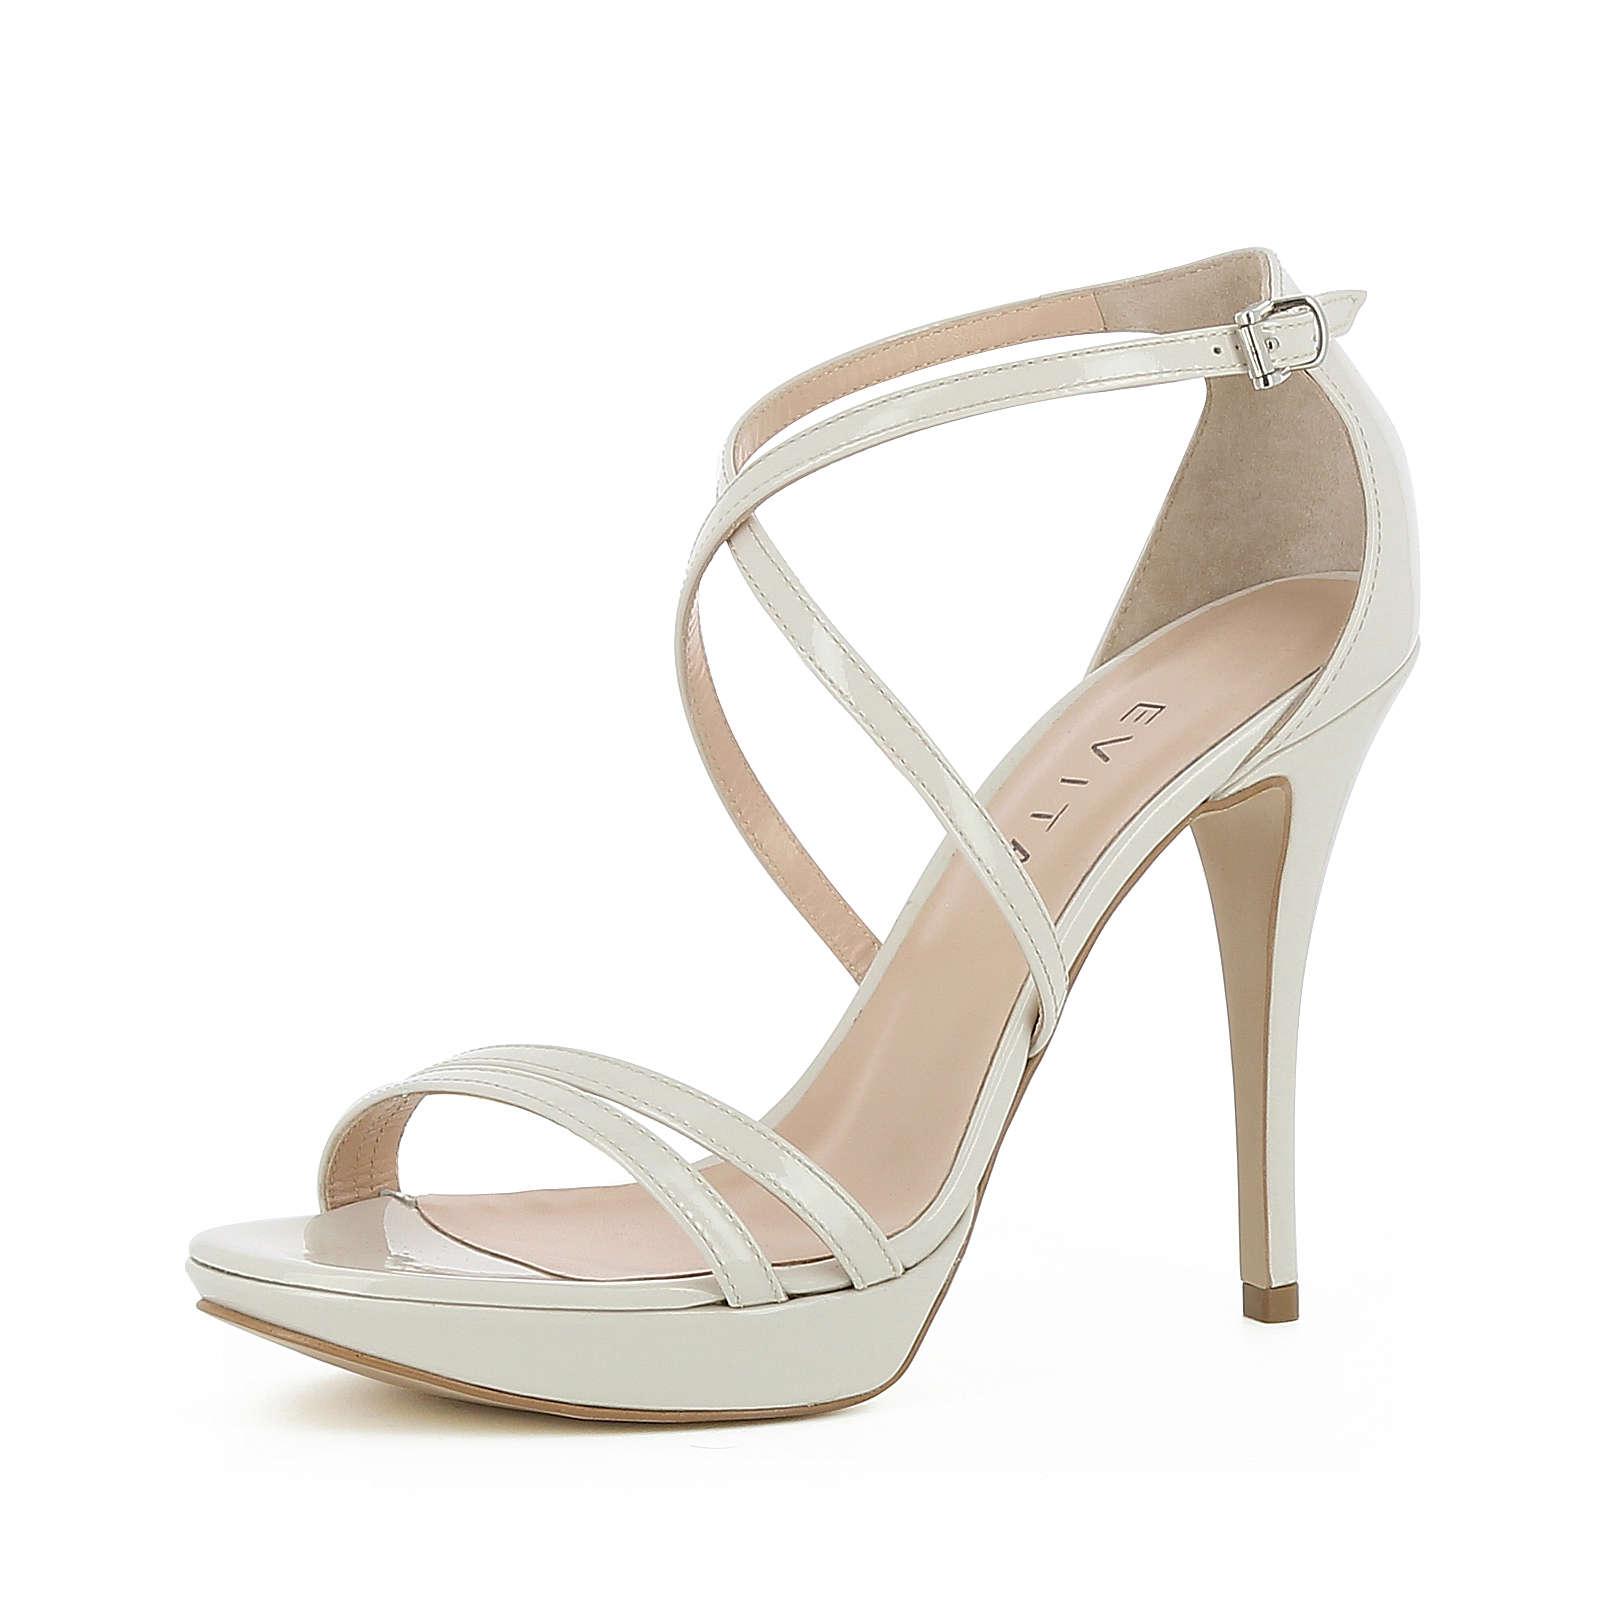 Evita Shoes Damen Sandalette VALERIA Klassische Sandaletten beige Damen Gr. 34